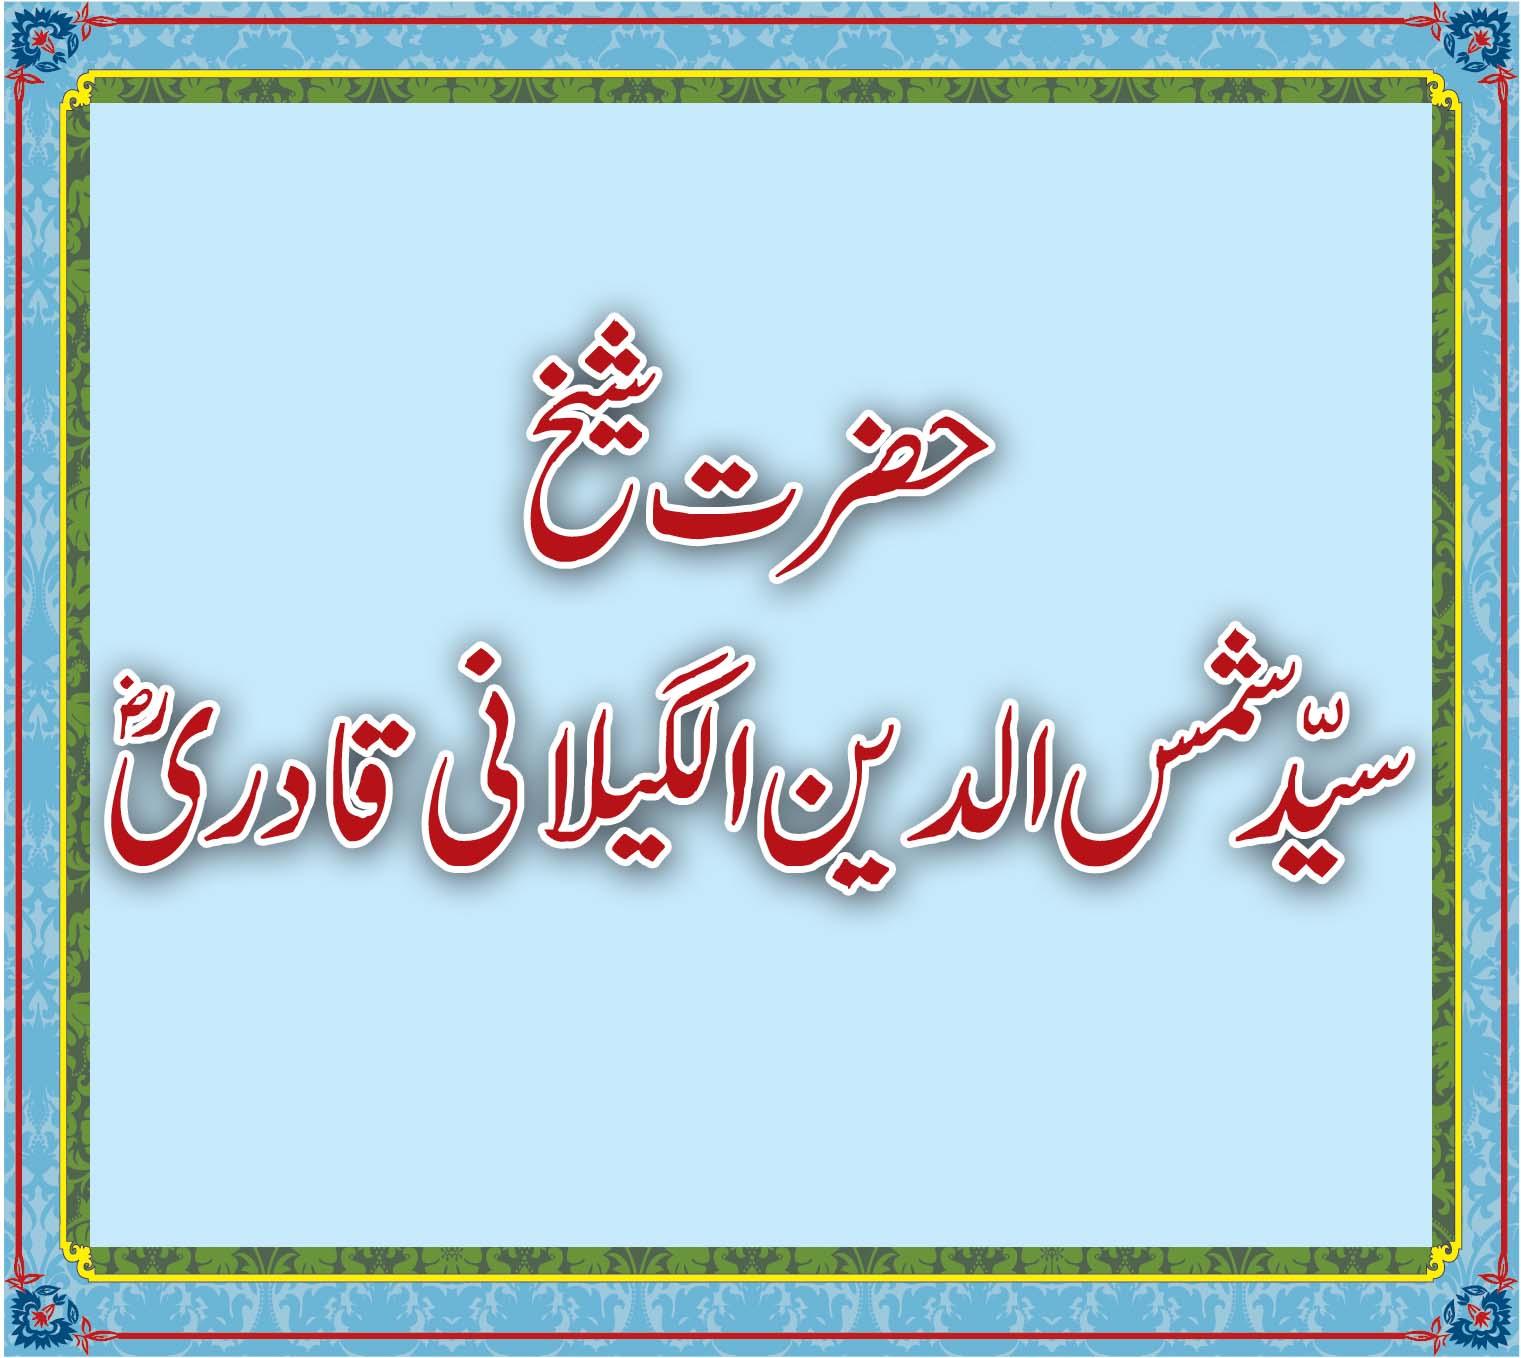 Shams Uddin